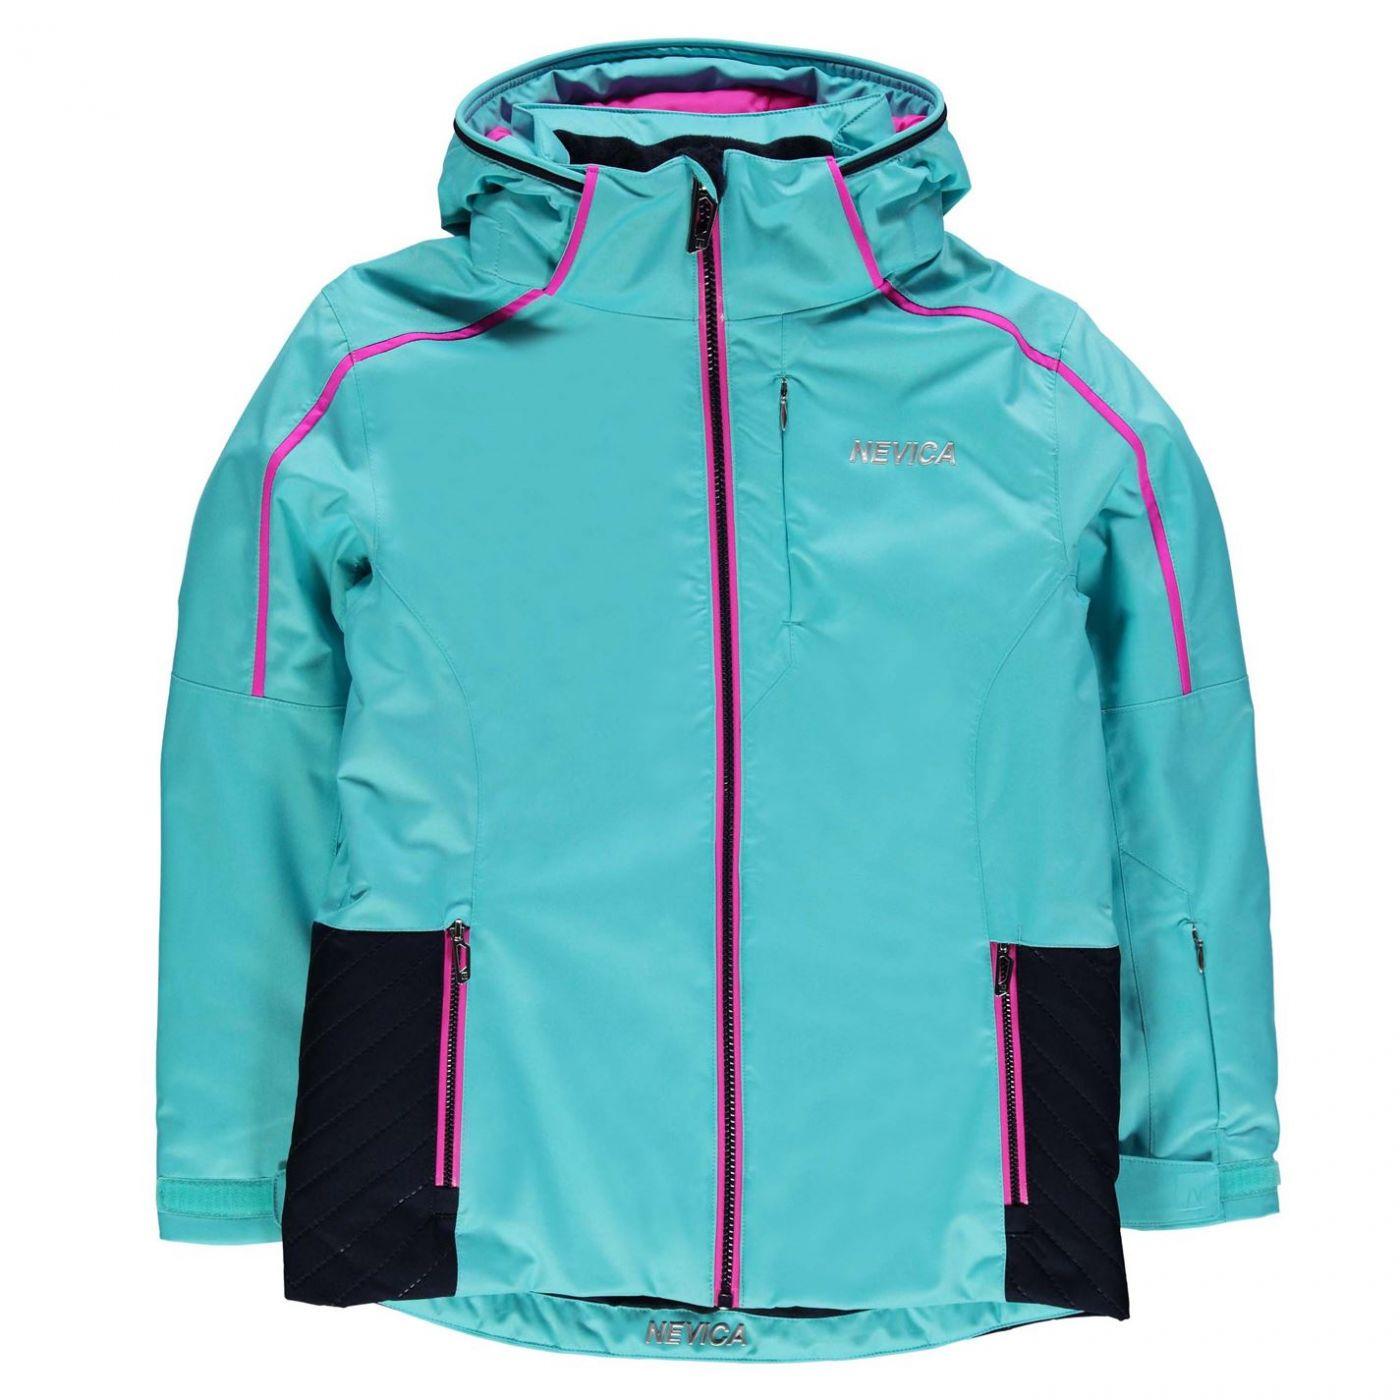 Nevica Meribel Girls Ski Jacket Age 7-8 RRP £99.99 BNWT